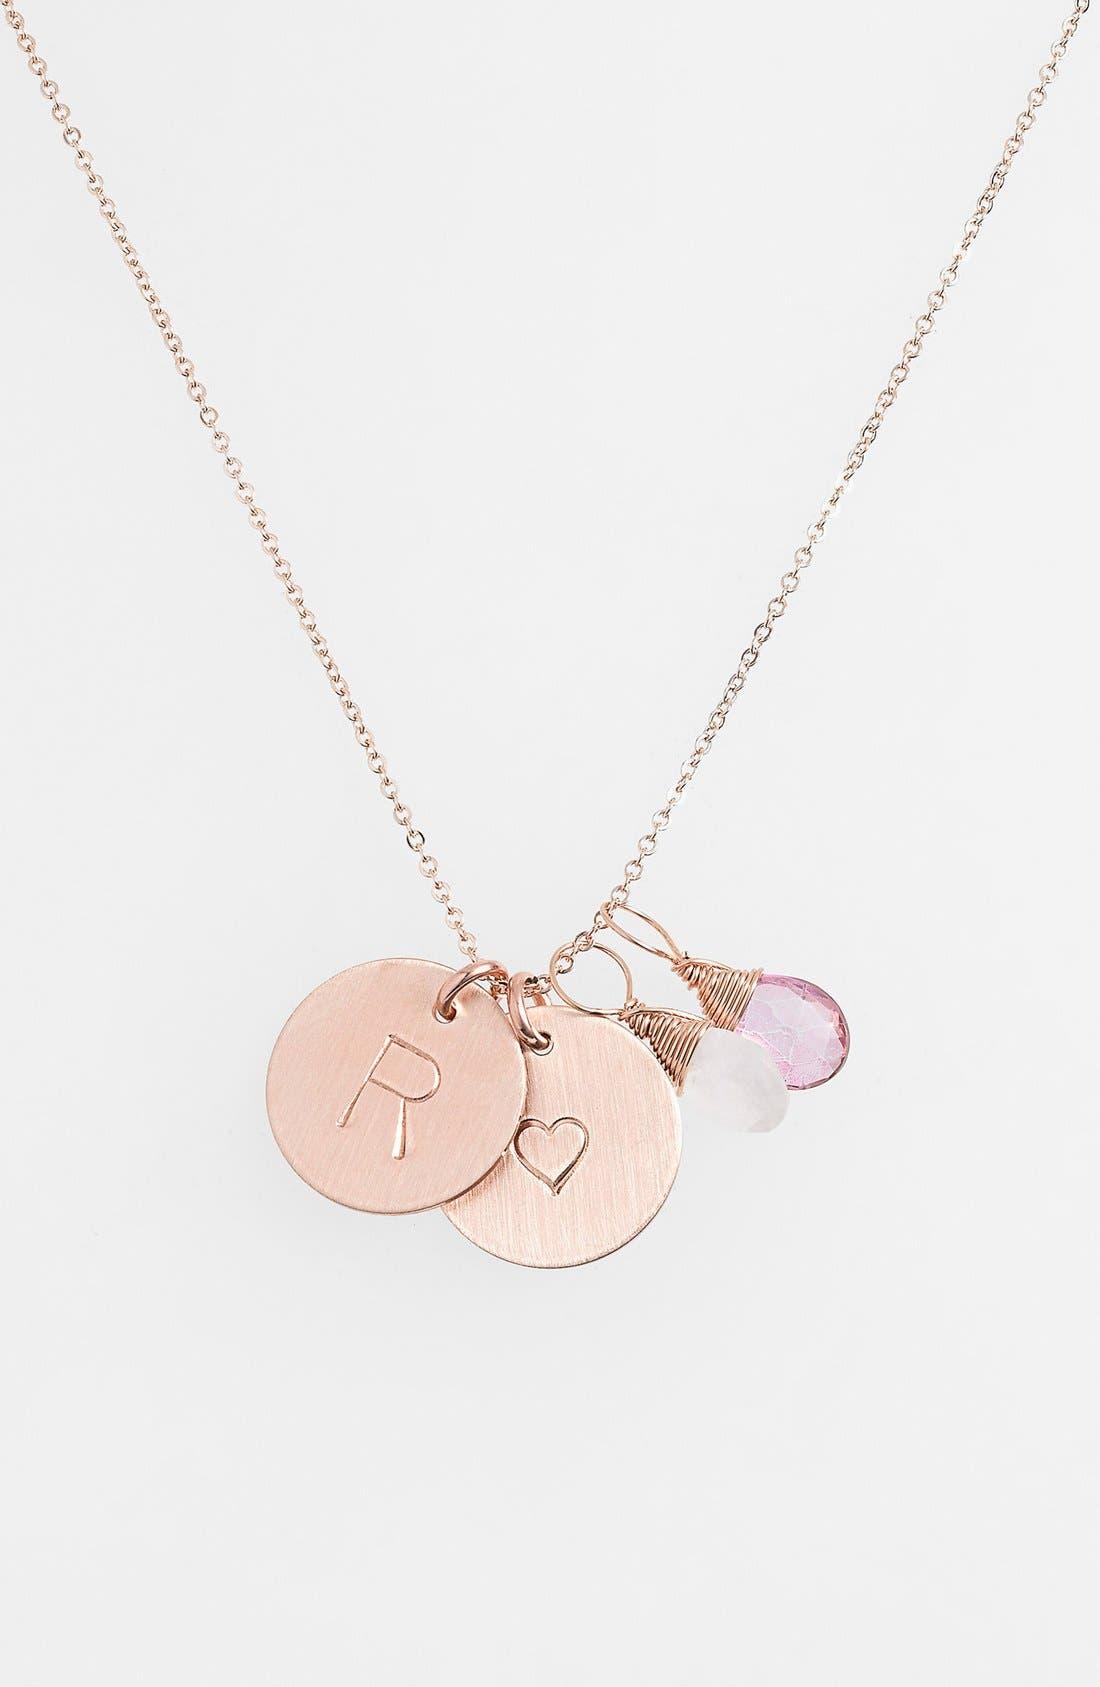 Alternate Image 1 Selected - Nashelle 14k-Gold Fill Heart Disc, Moonstone & Pink Quartz Initial Necklace